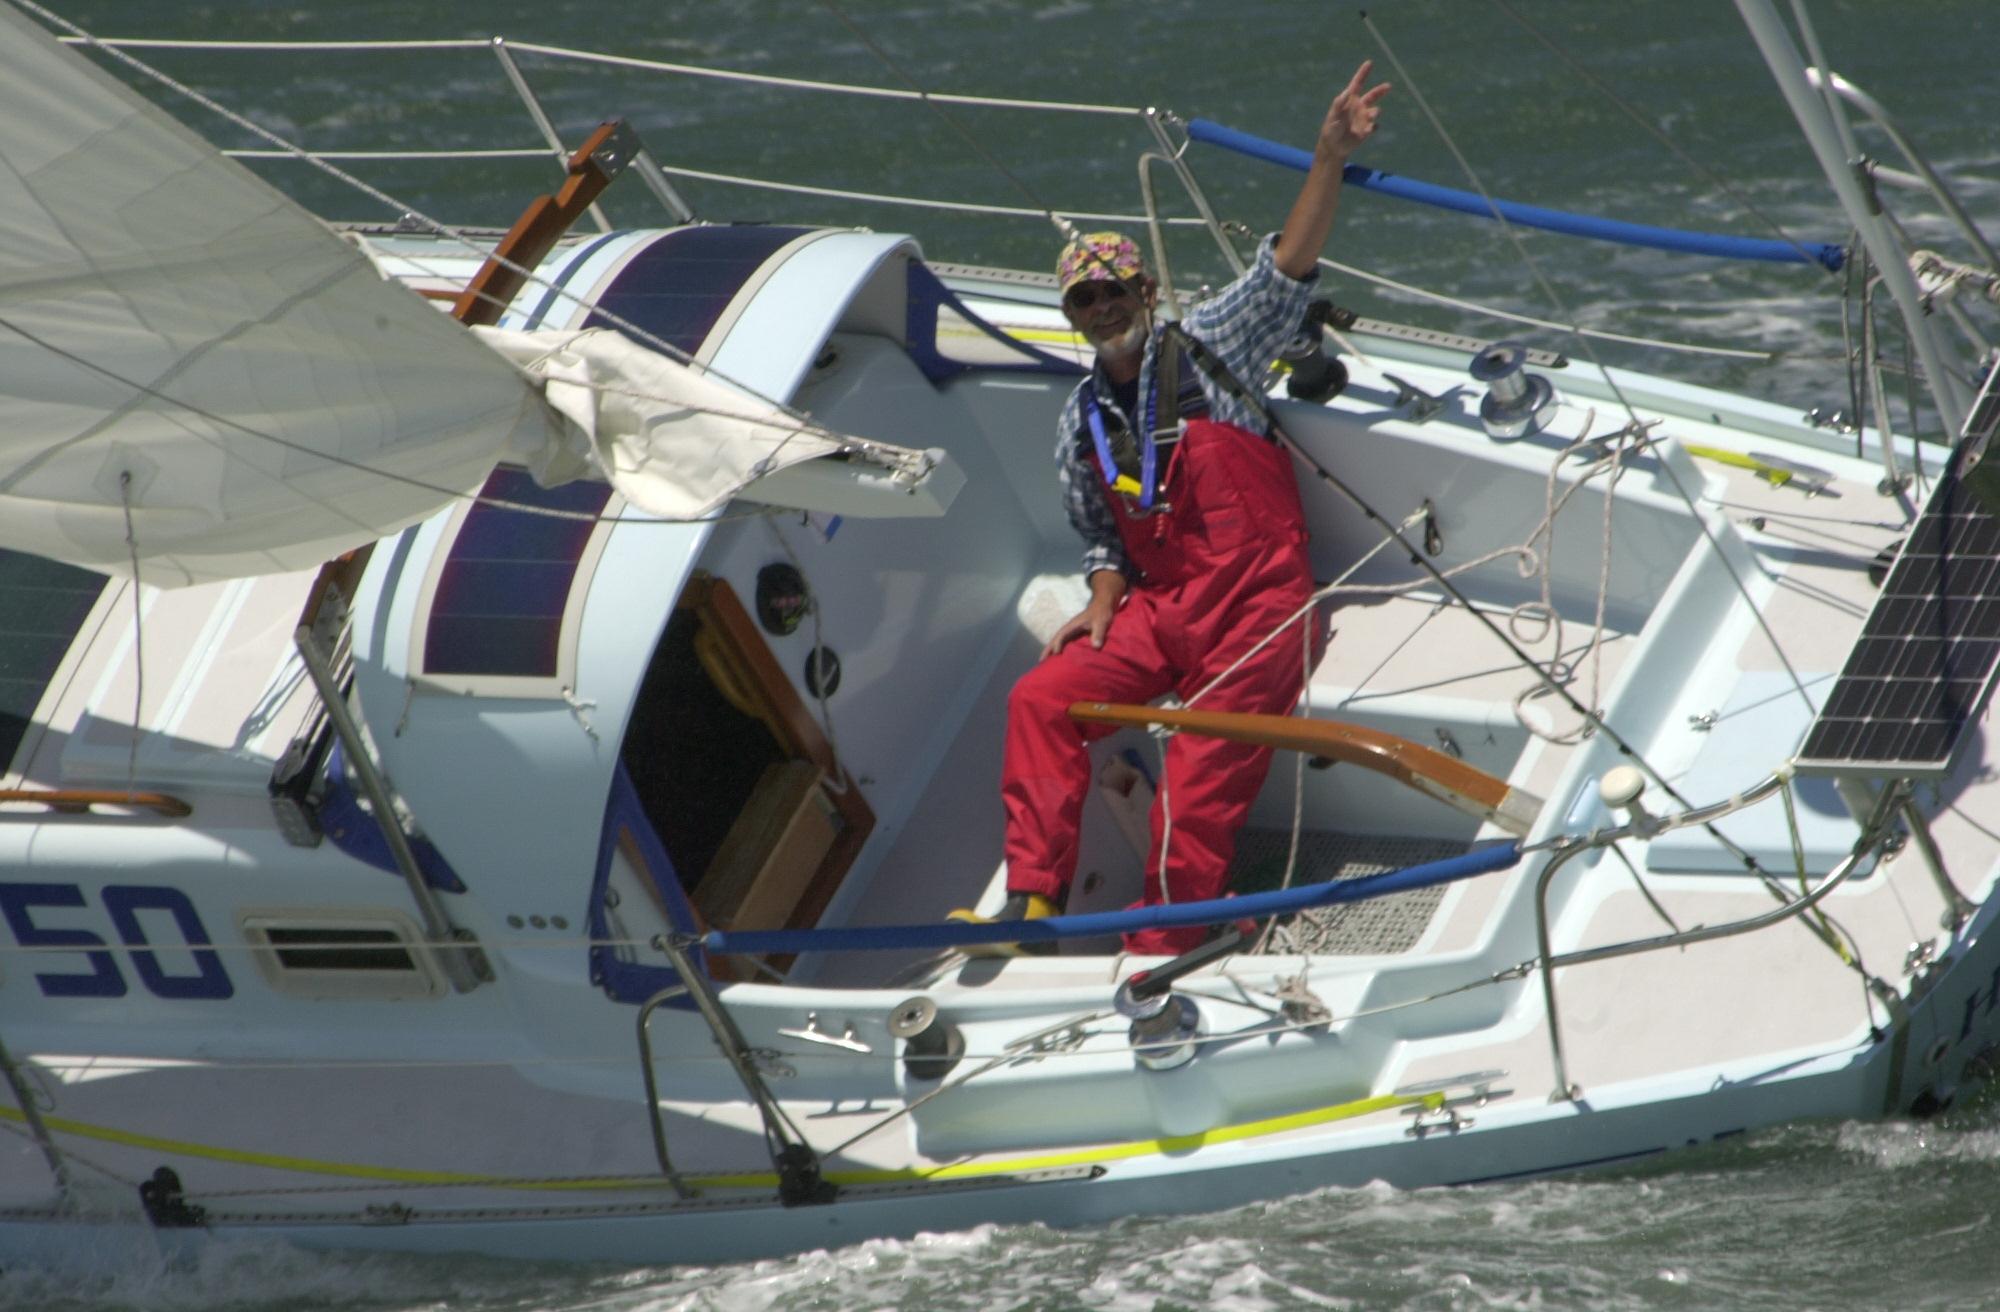 Mini Boats, Maxi Race: DISC Sponsors Elite Singlehanded Sailor